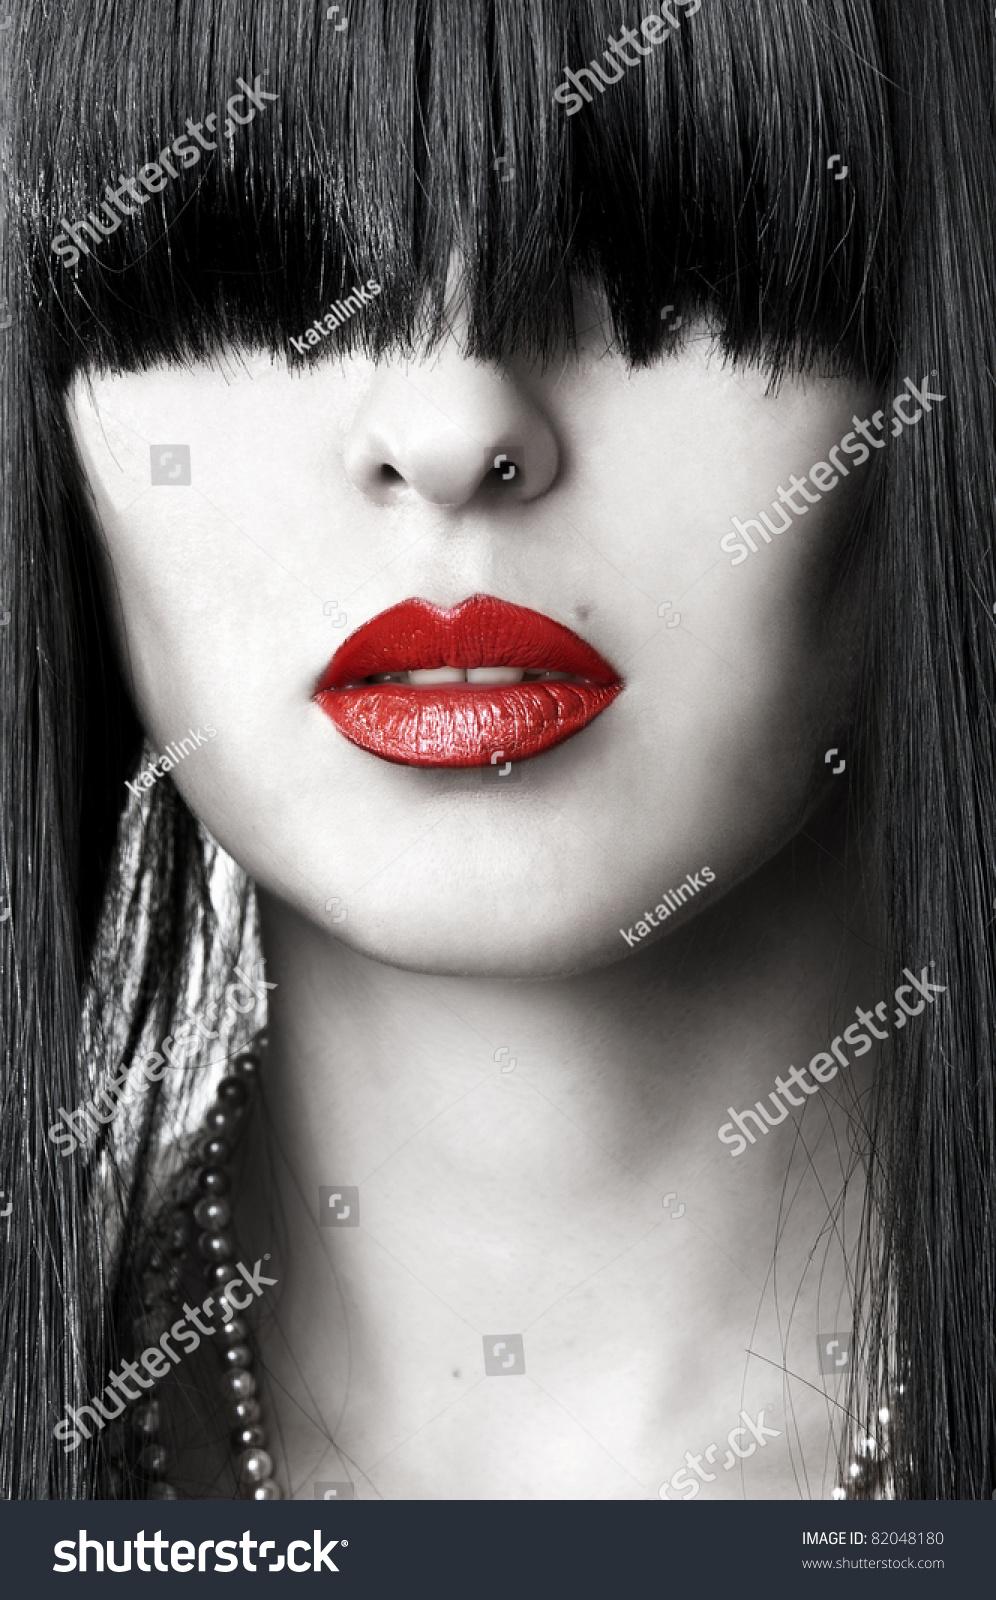 Black White Red Closeup Fashion Portrait Stock Photo ...